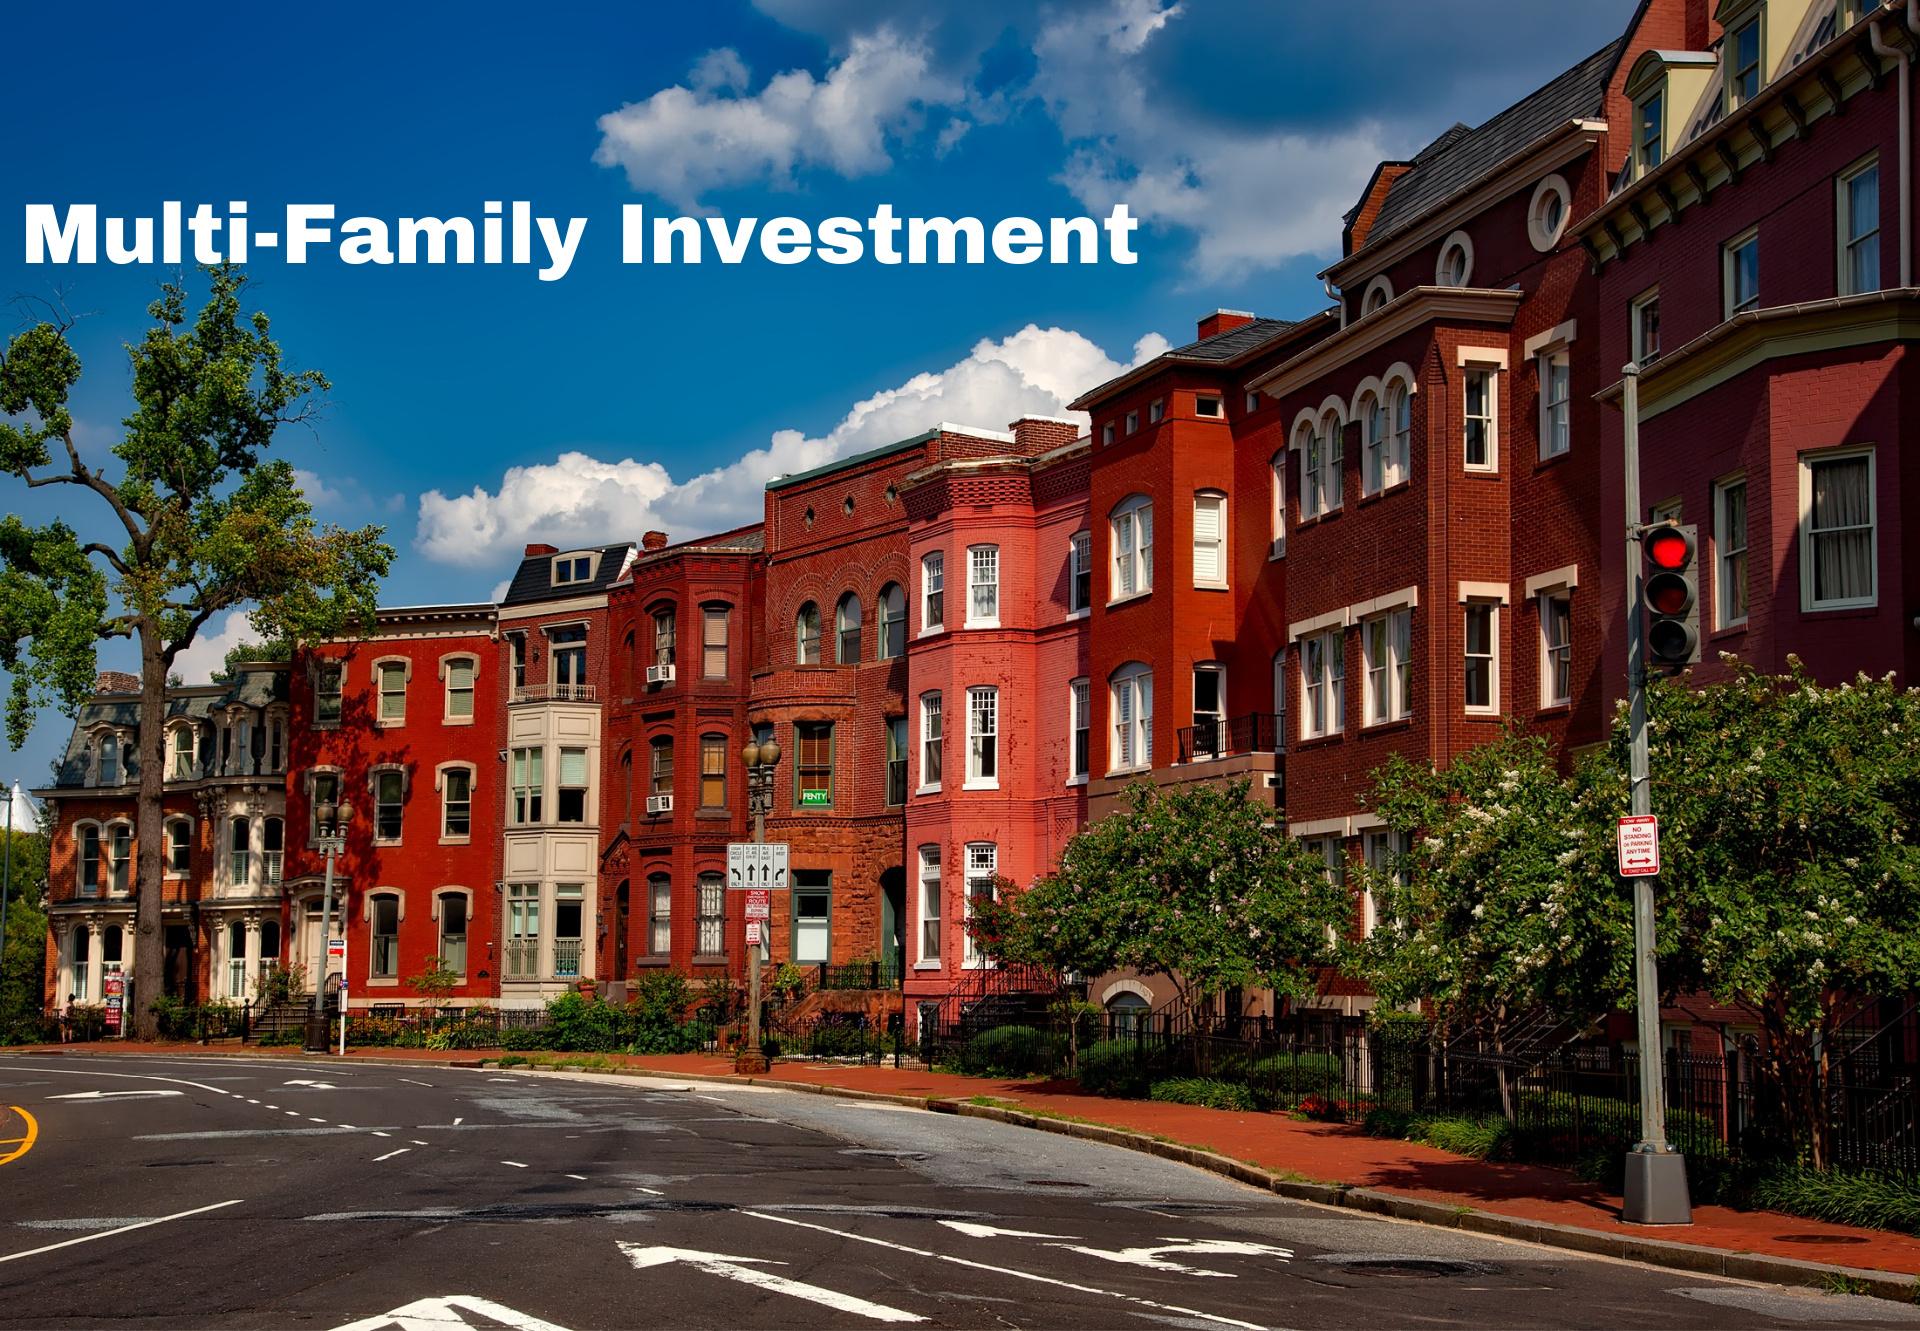 https://0201.nccdn.net/4_2/000/000/06b/a1b/Multi-Family-Investment2-1920x1331.jpg